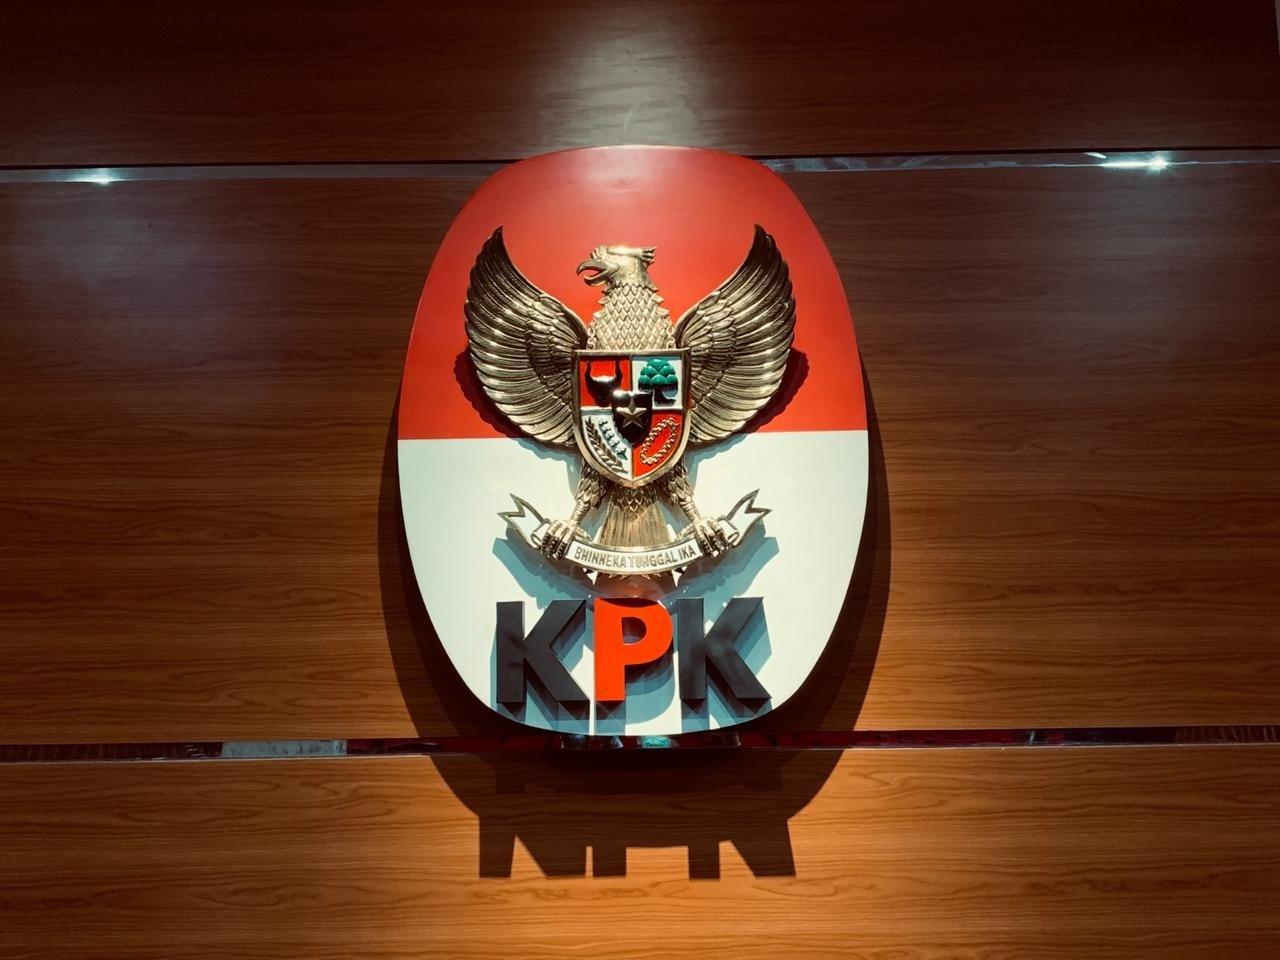 Sorotan Tajam Akademisi Soal Independensi KPK, ICW Ikut Terseret